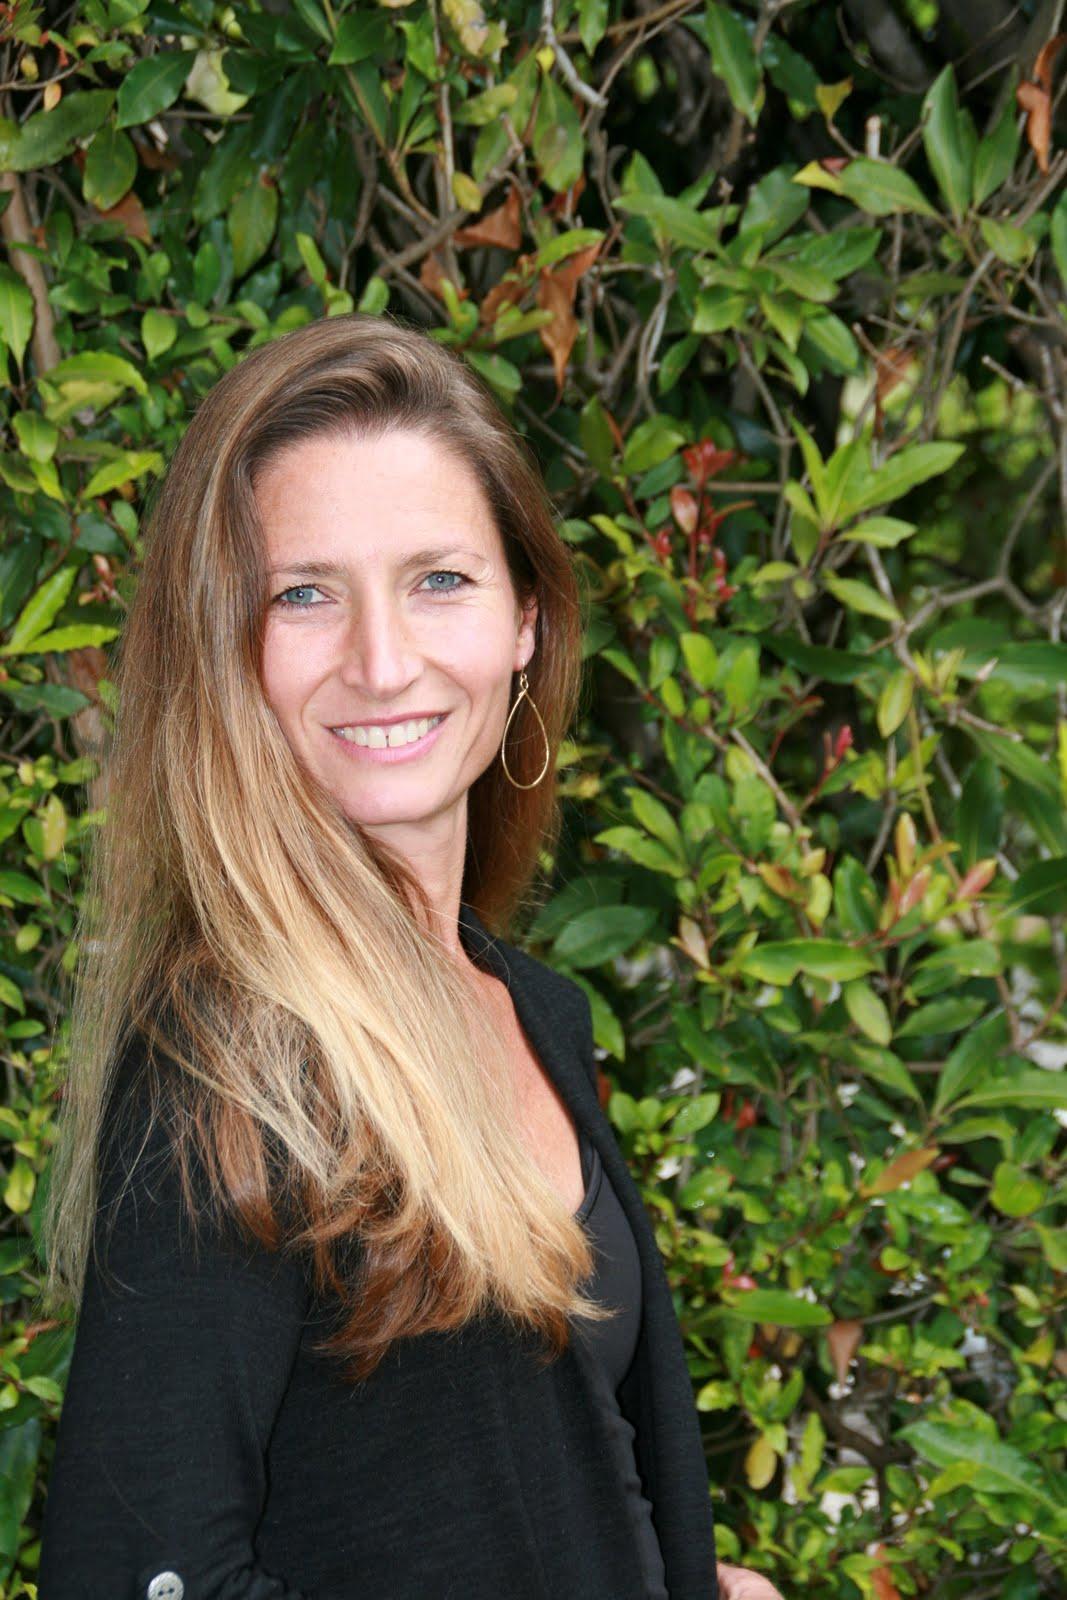 Jessica Powell